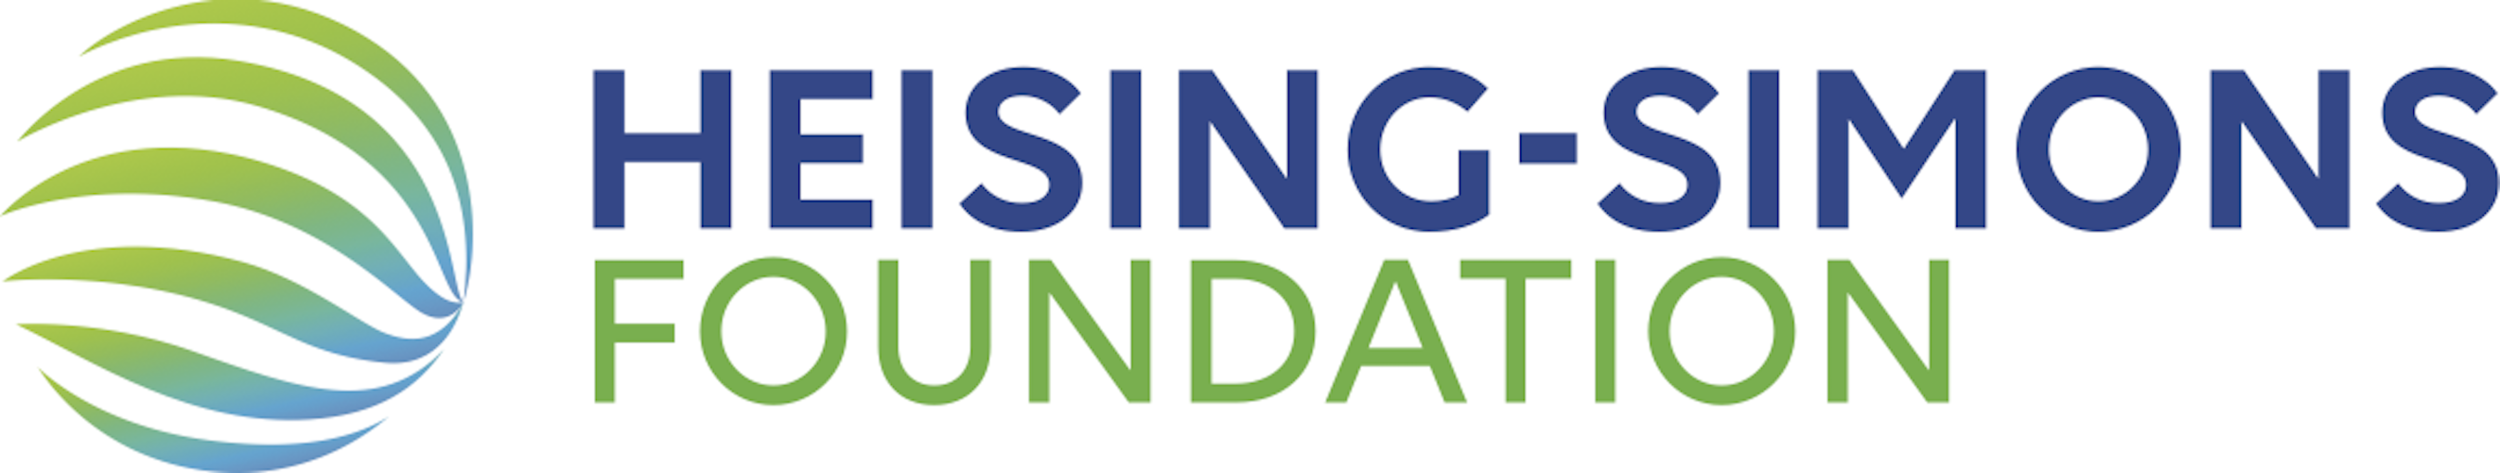 Heising Simons logo.png